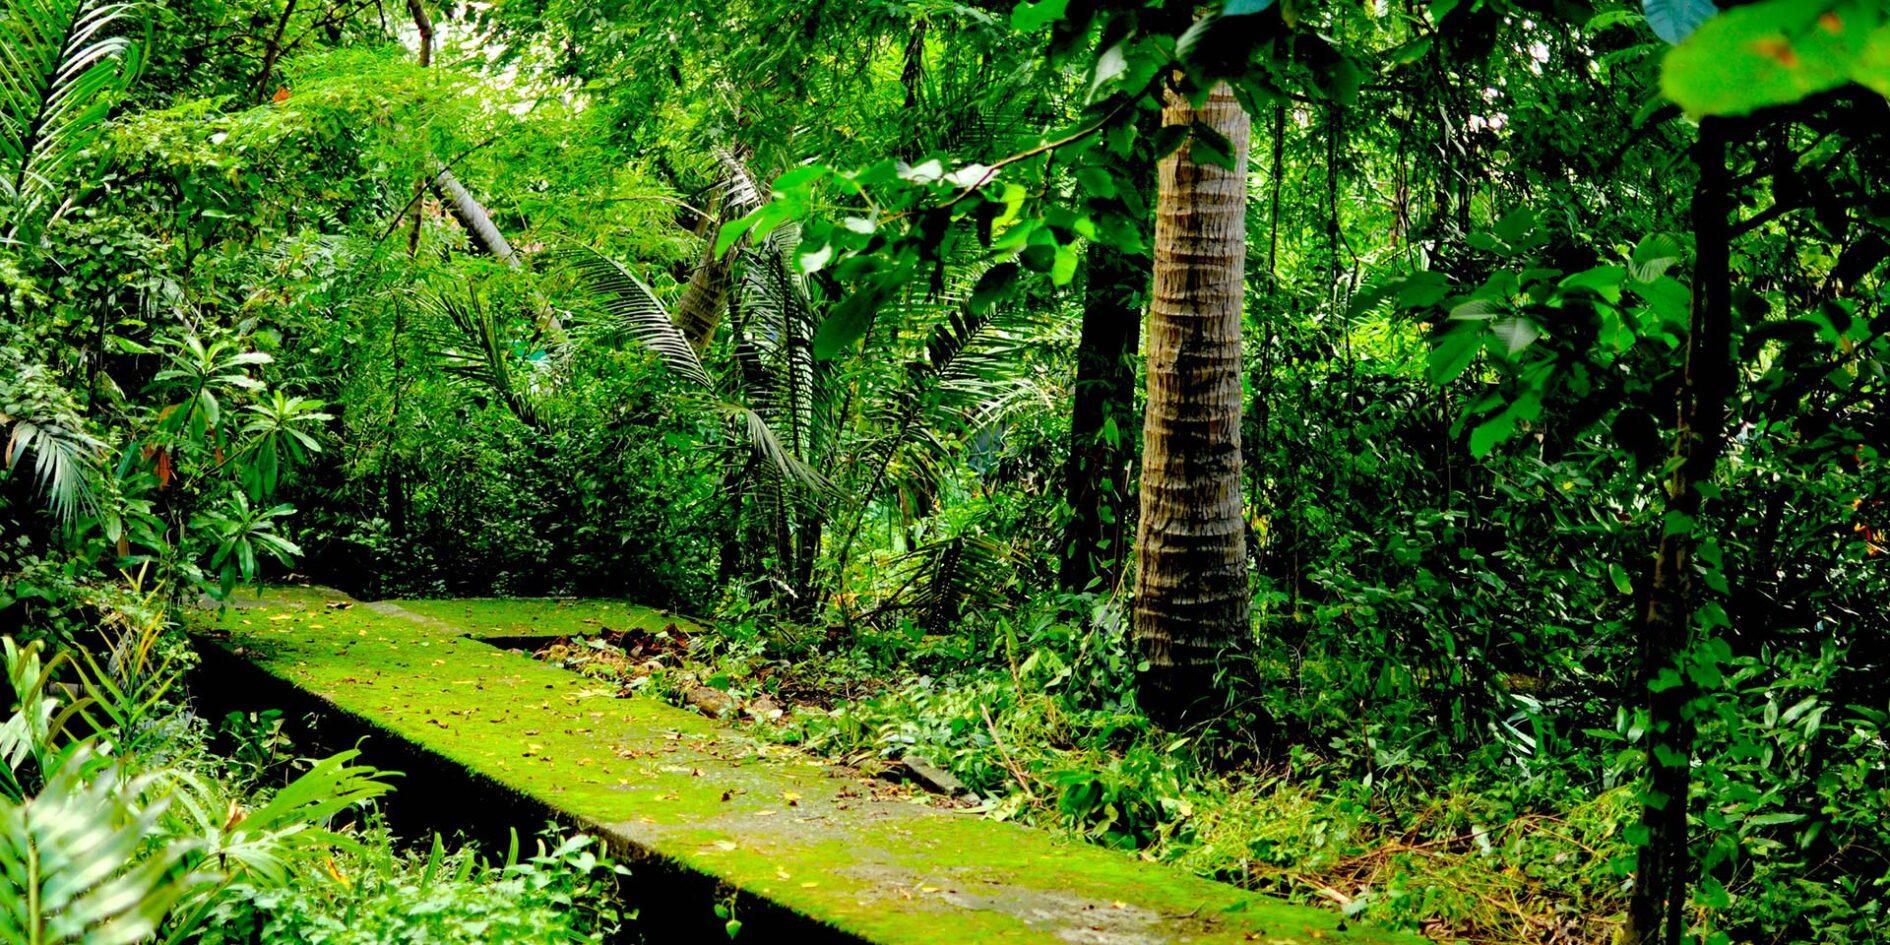 GREEN LUNG: BIKING THROUGH BANGKOK'S JUNGLE